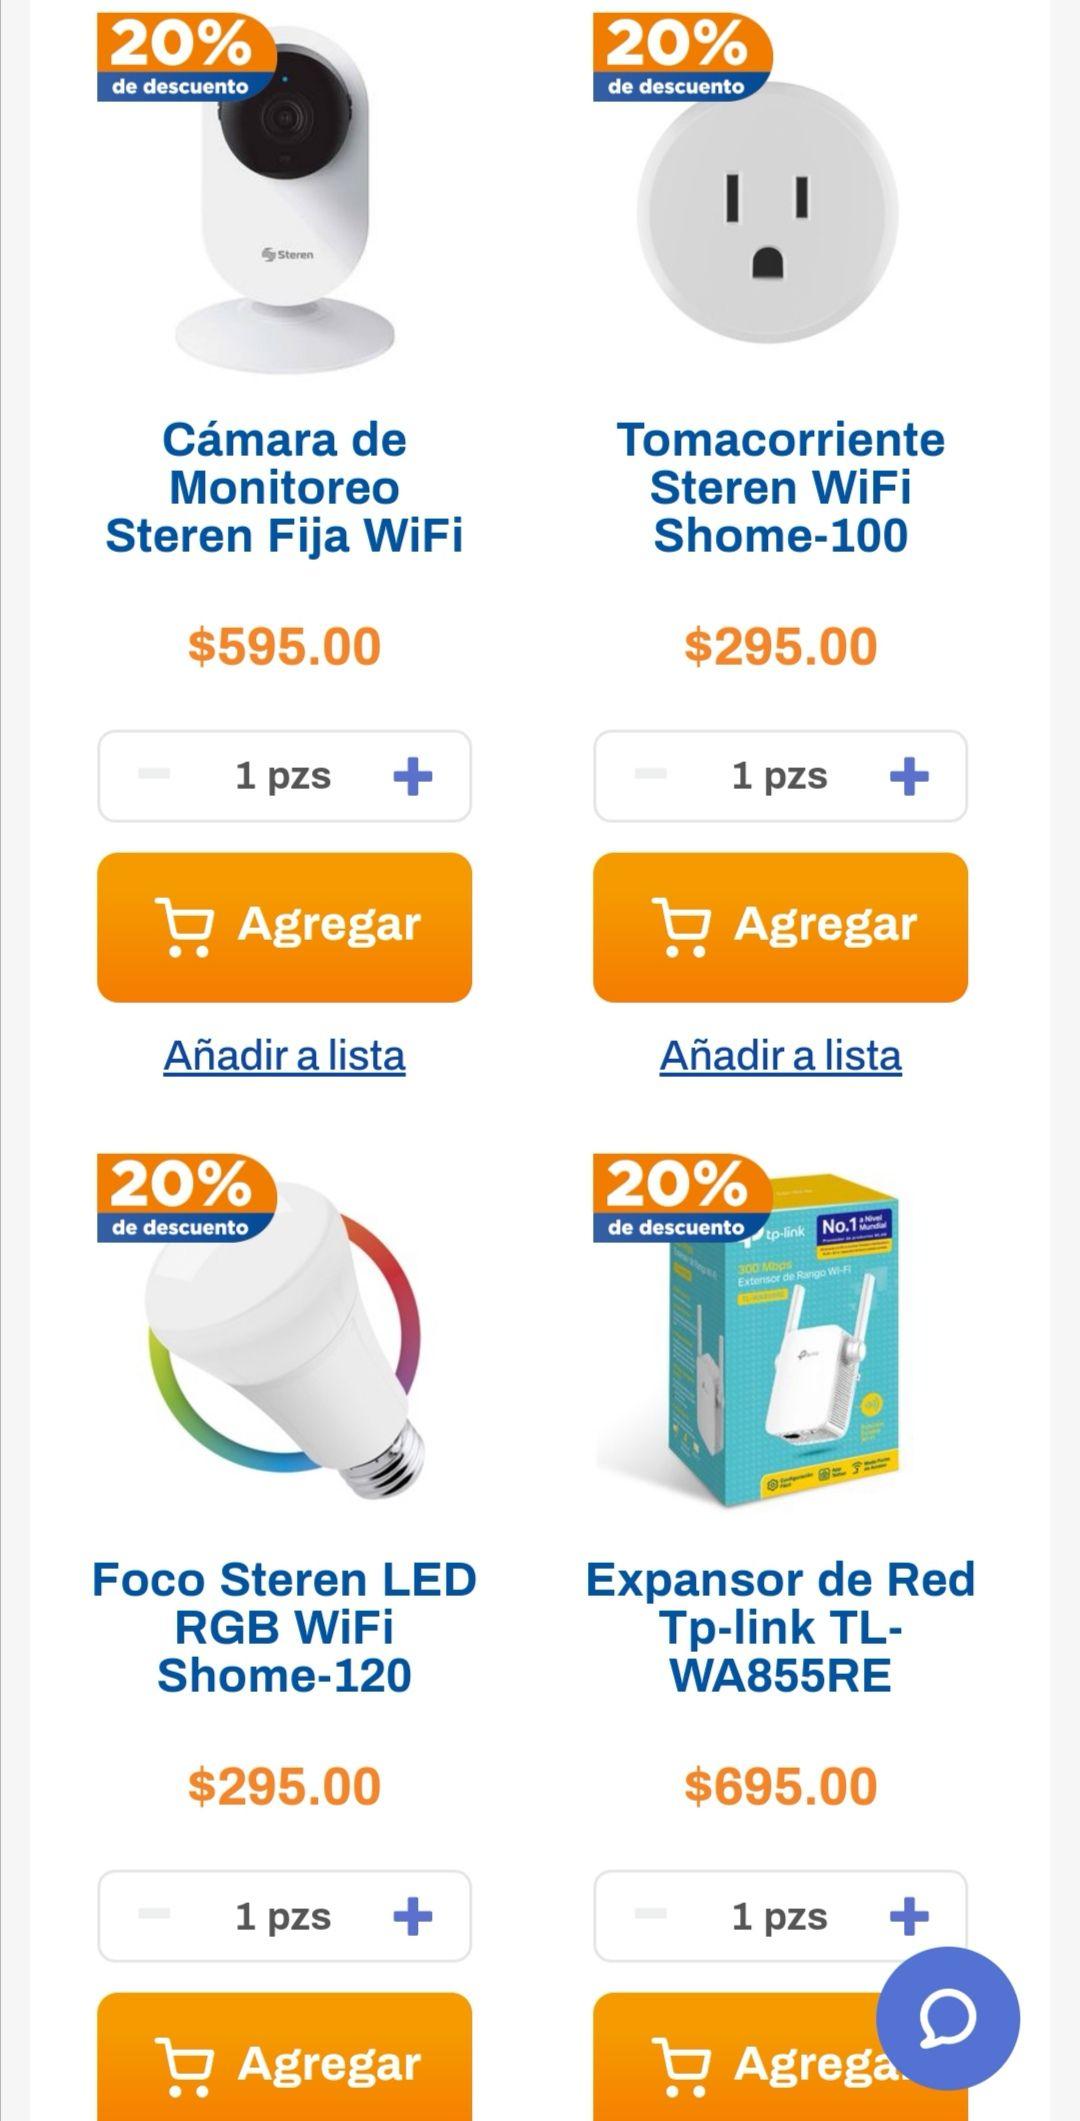 Chedraui: 20% de descuento en smart home Steren